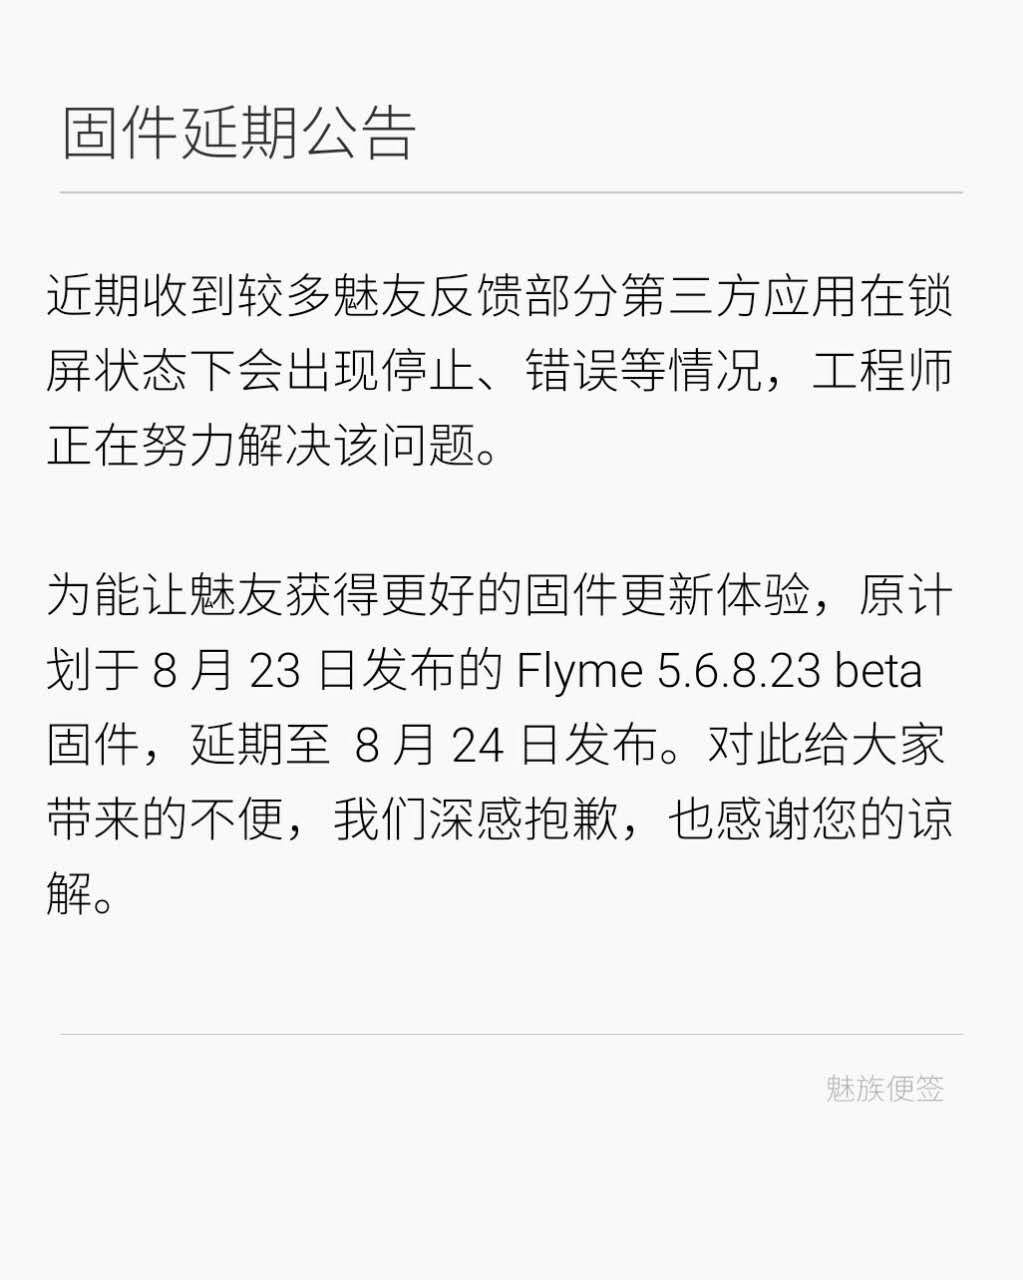 Flyme 5.6.8.23 betaは8月23日にリリースされず、8月24日にリリースされる予定。特定のアプリでクラッシュする問題があるため。